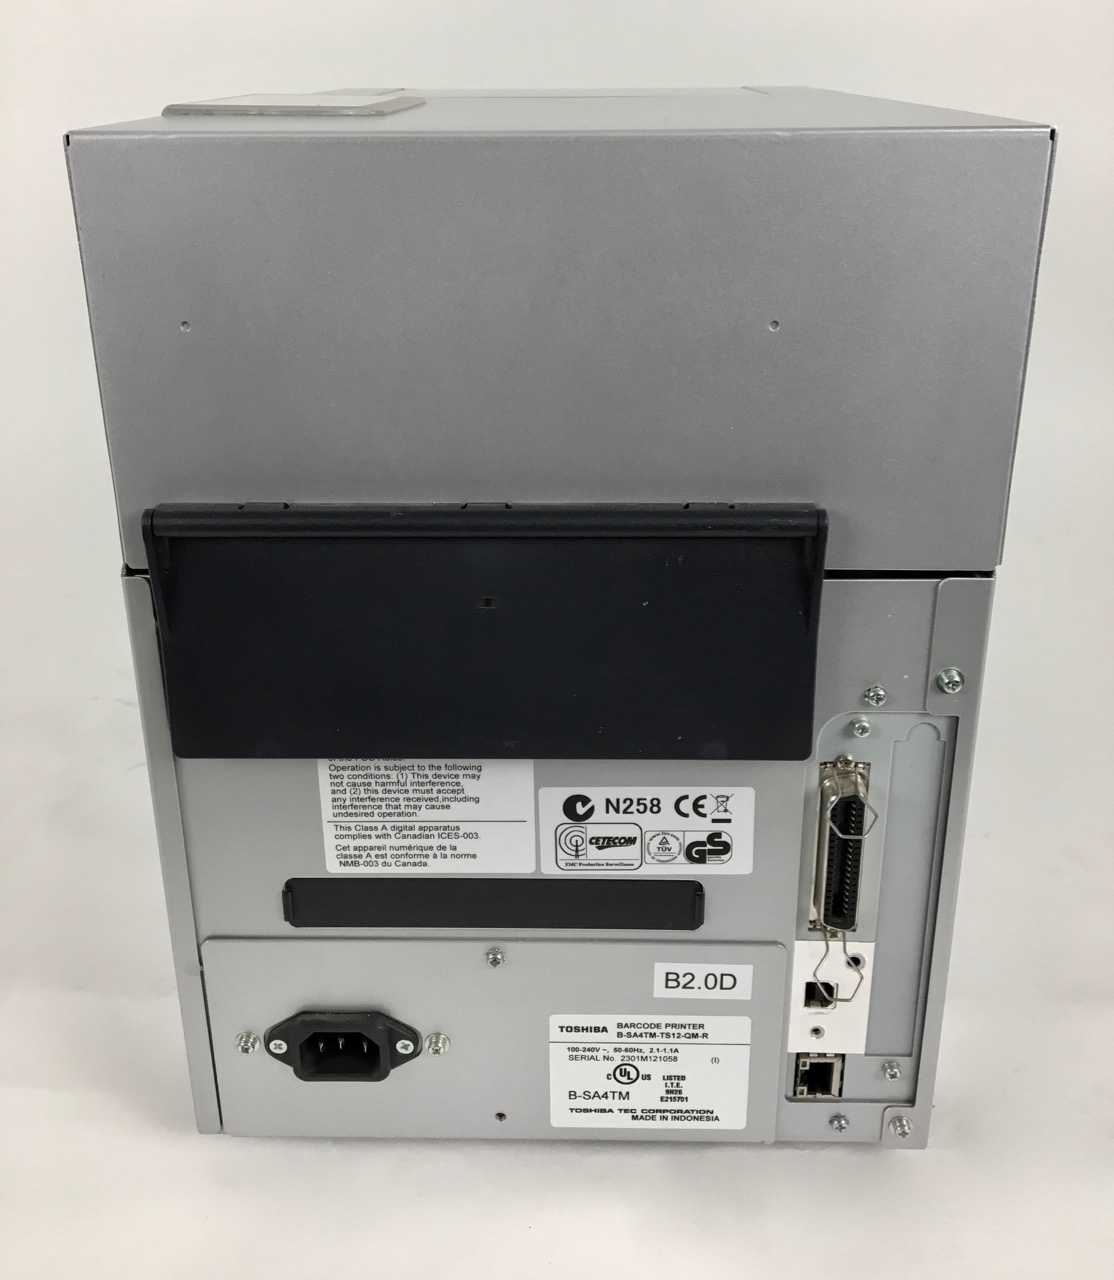 Toshiba Refurbished Toshiba B-SA4TM GS12/TS12 label/ thermal printer  (300 dpi)